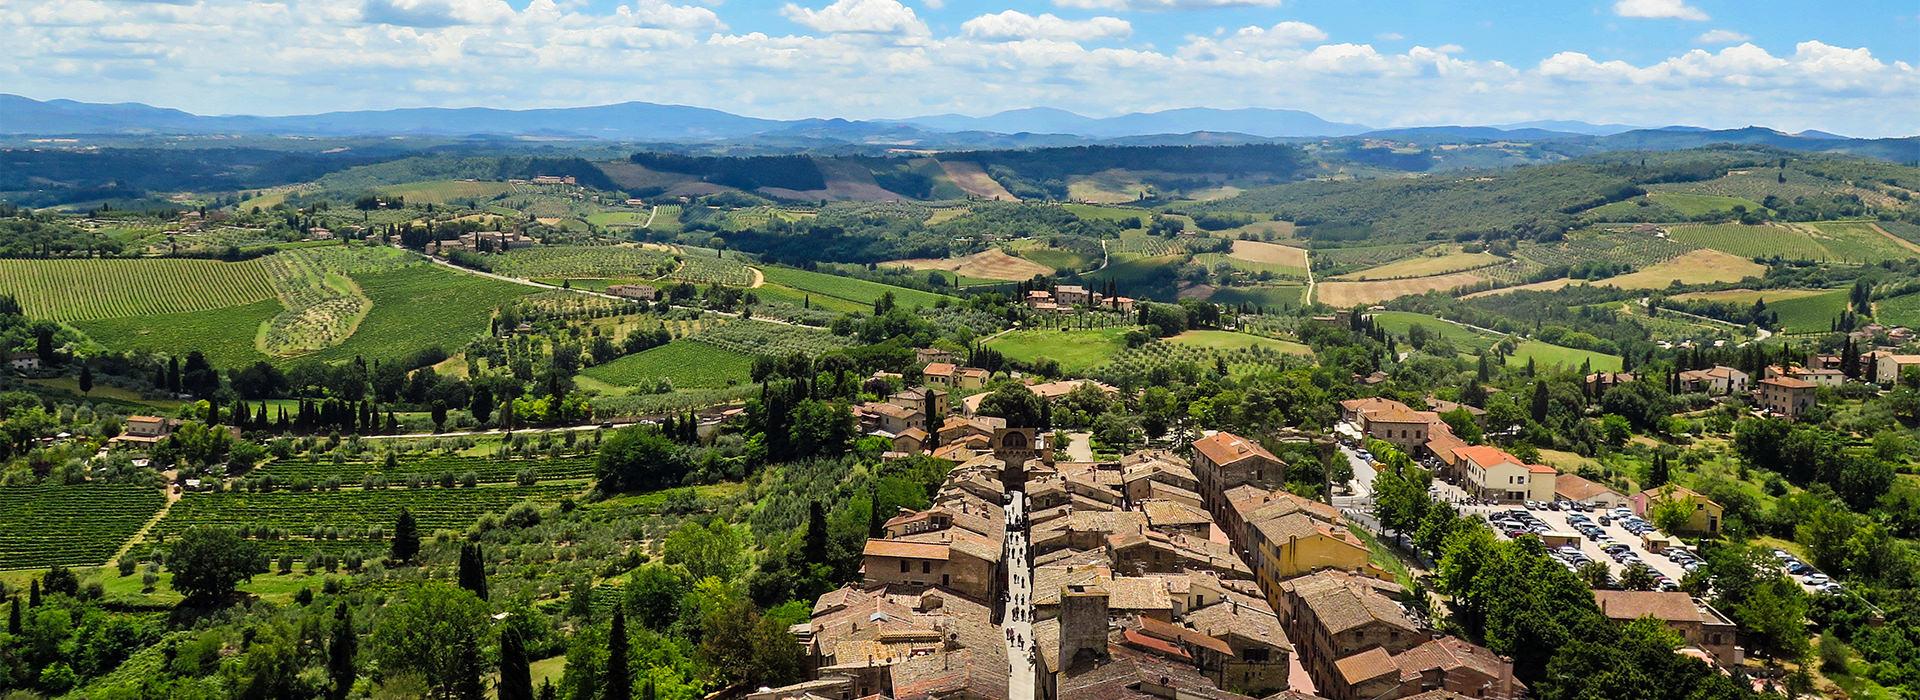 Tuscany Motorcycle Tours